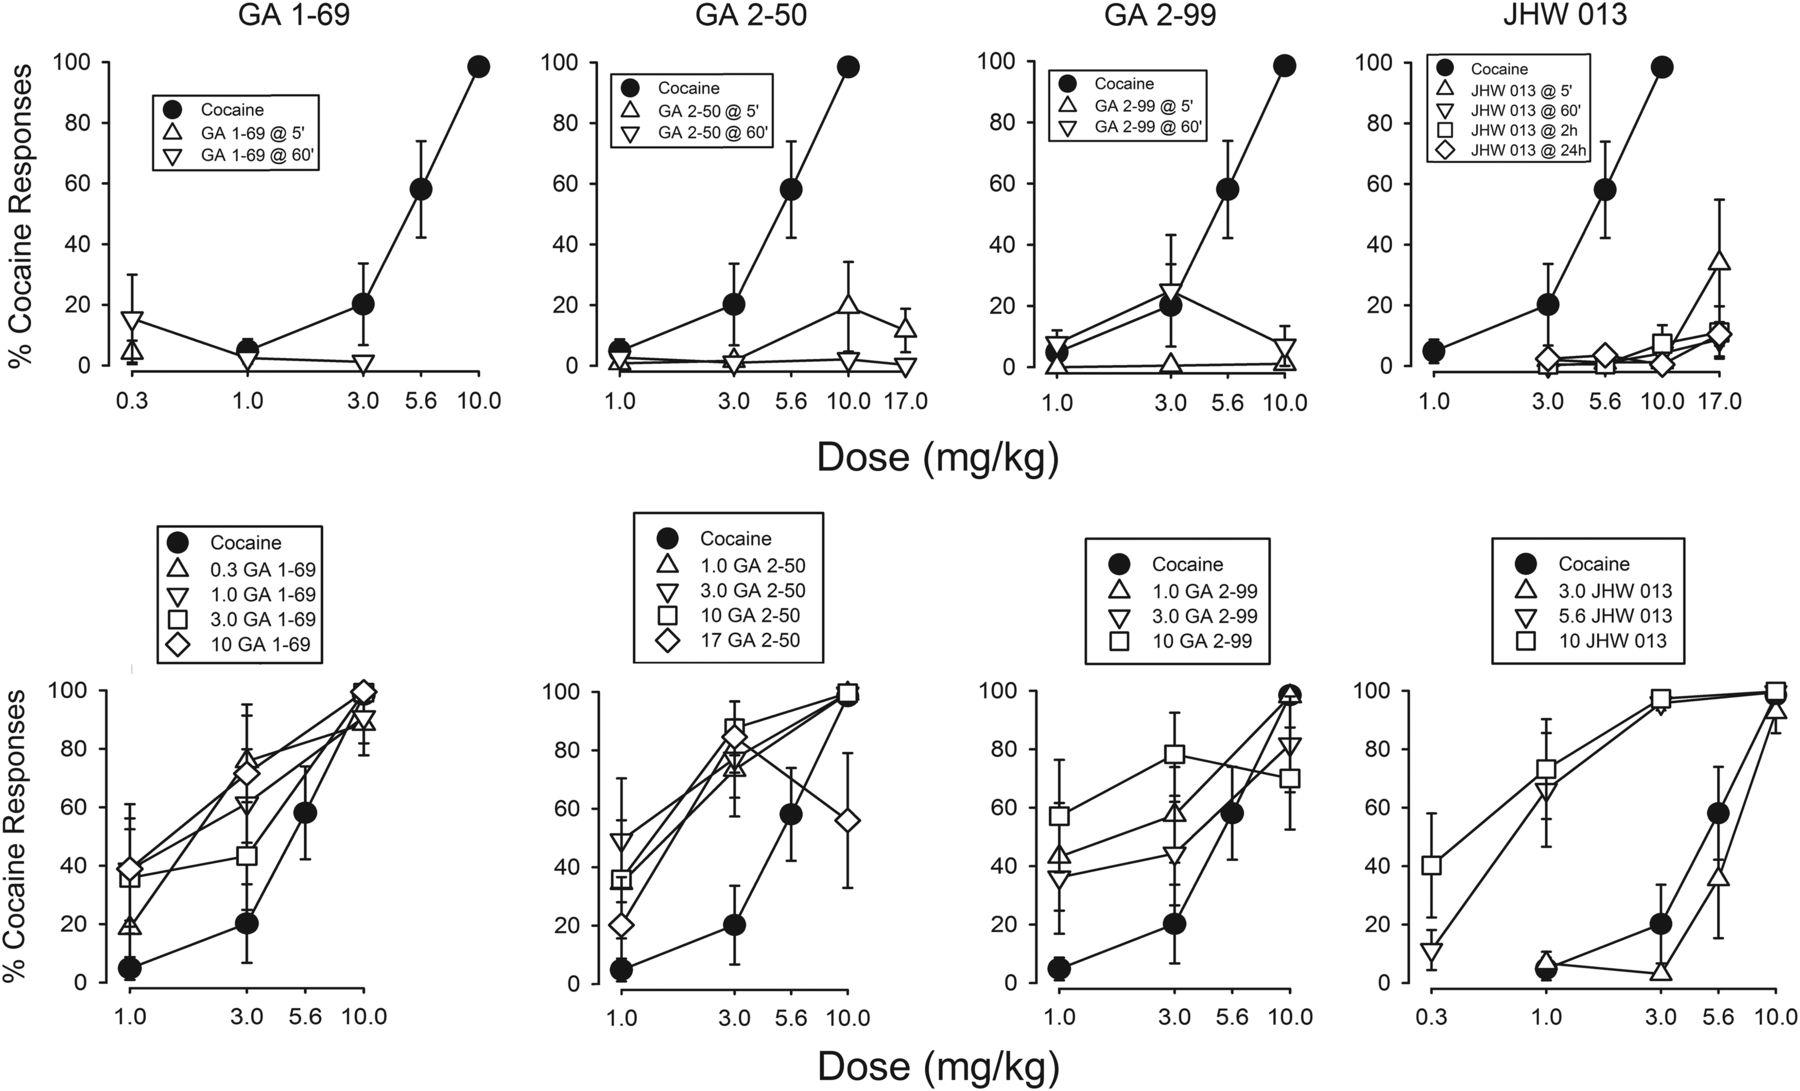 Dopamine Transporter Dynamics of N-Substituted Benztropine